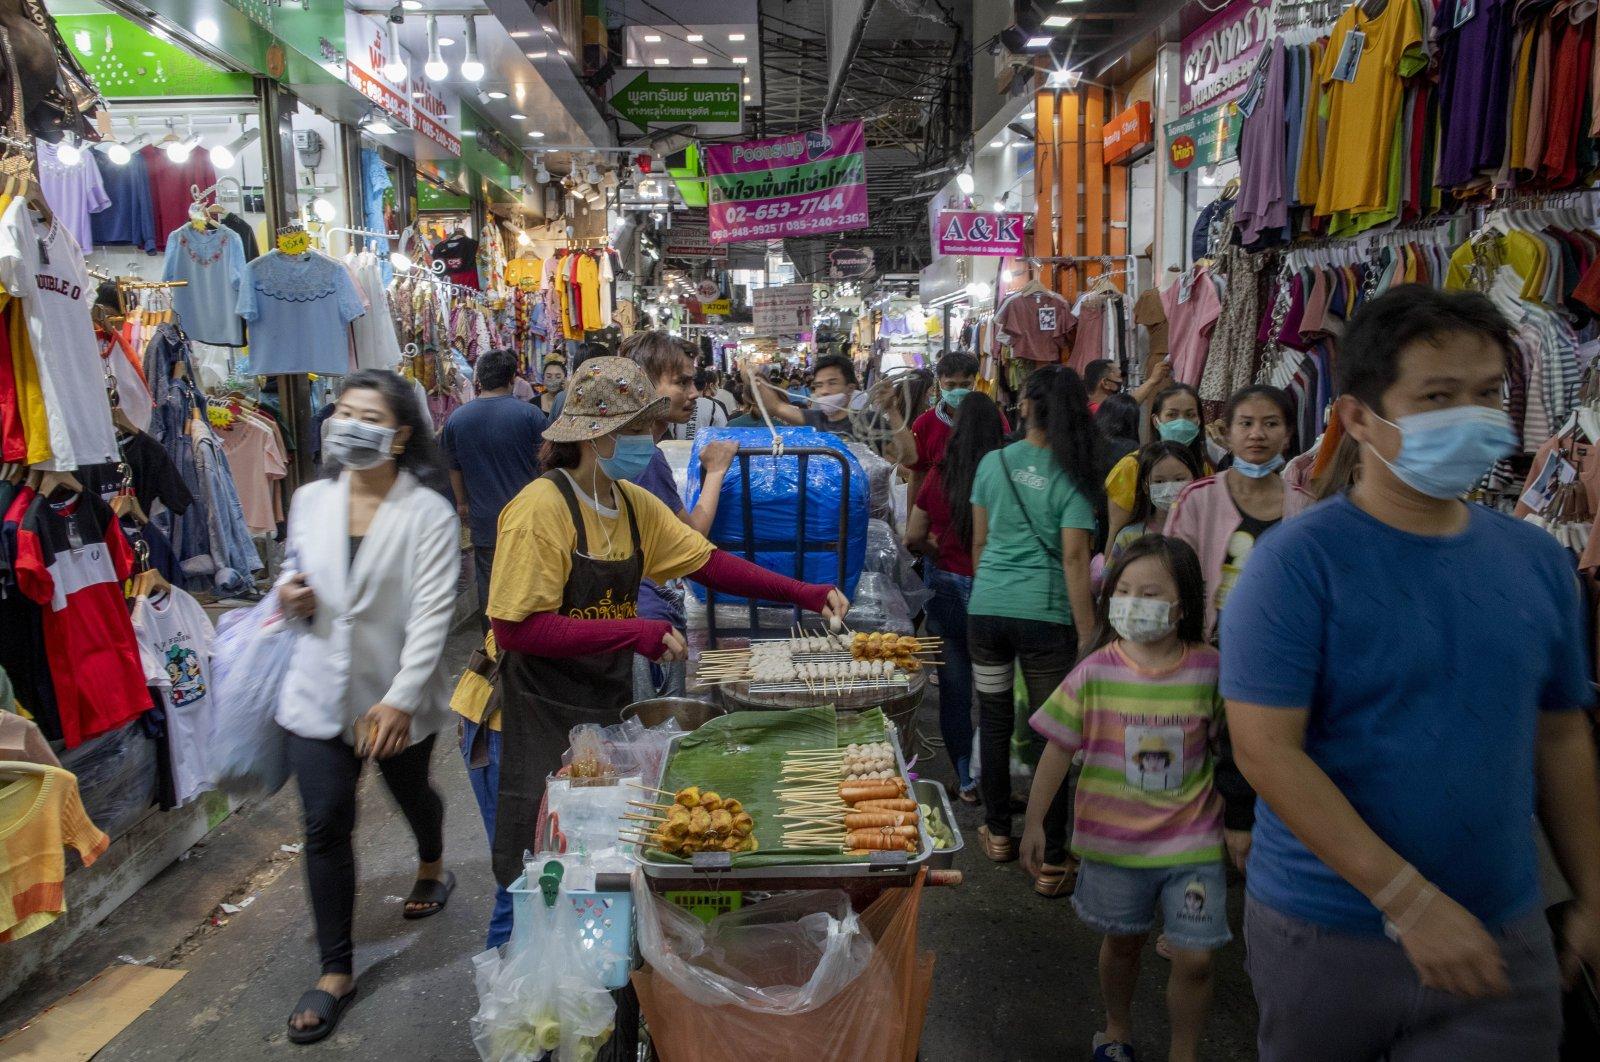 Shoppers walk through a clothing market in Bangkok, Thailand, Aug. 6, 2020.  (AP Photo)